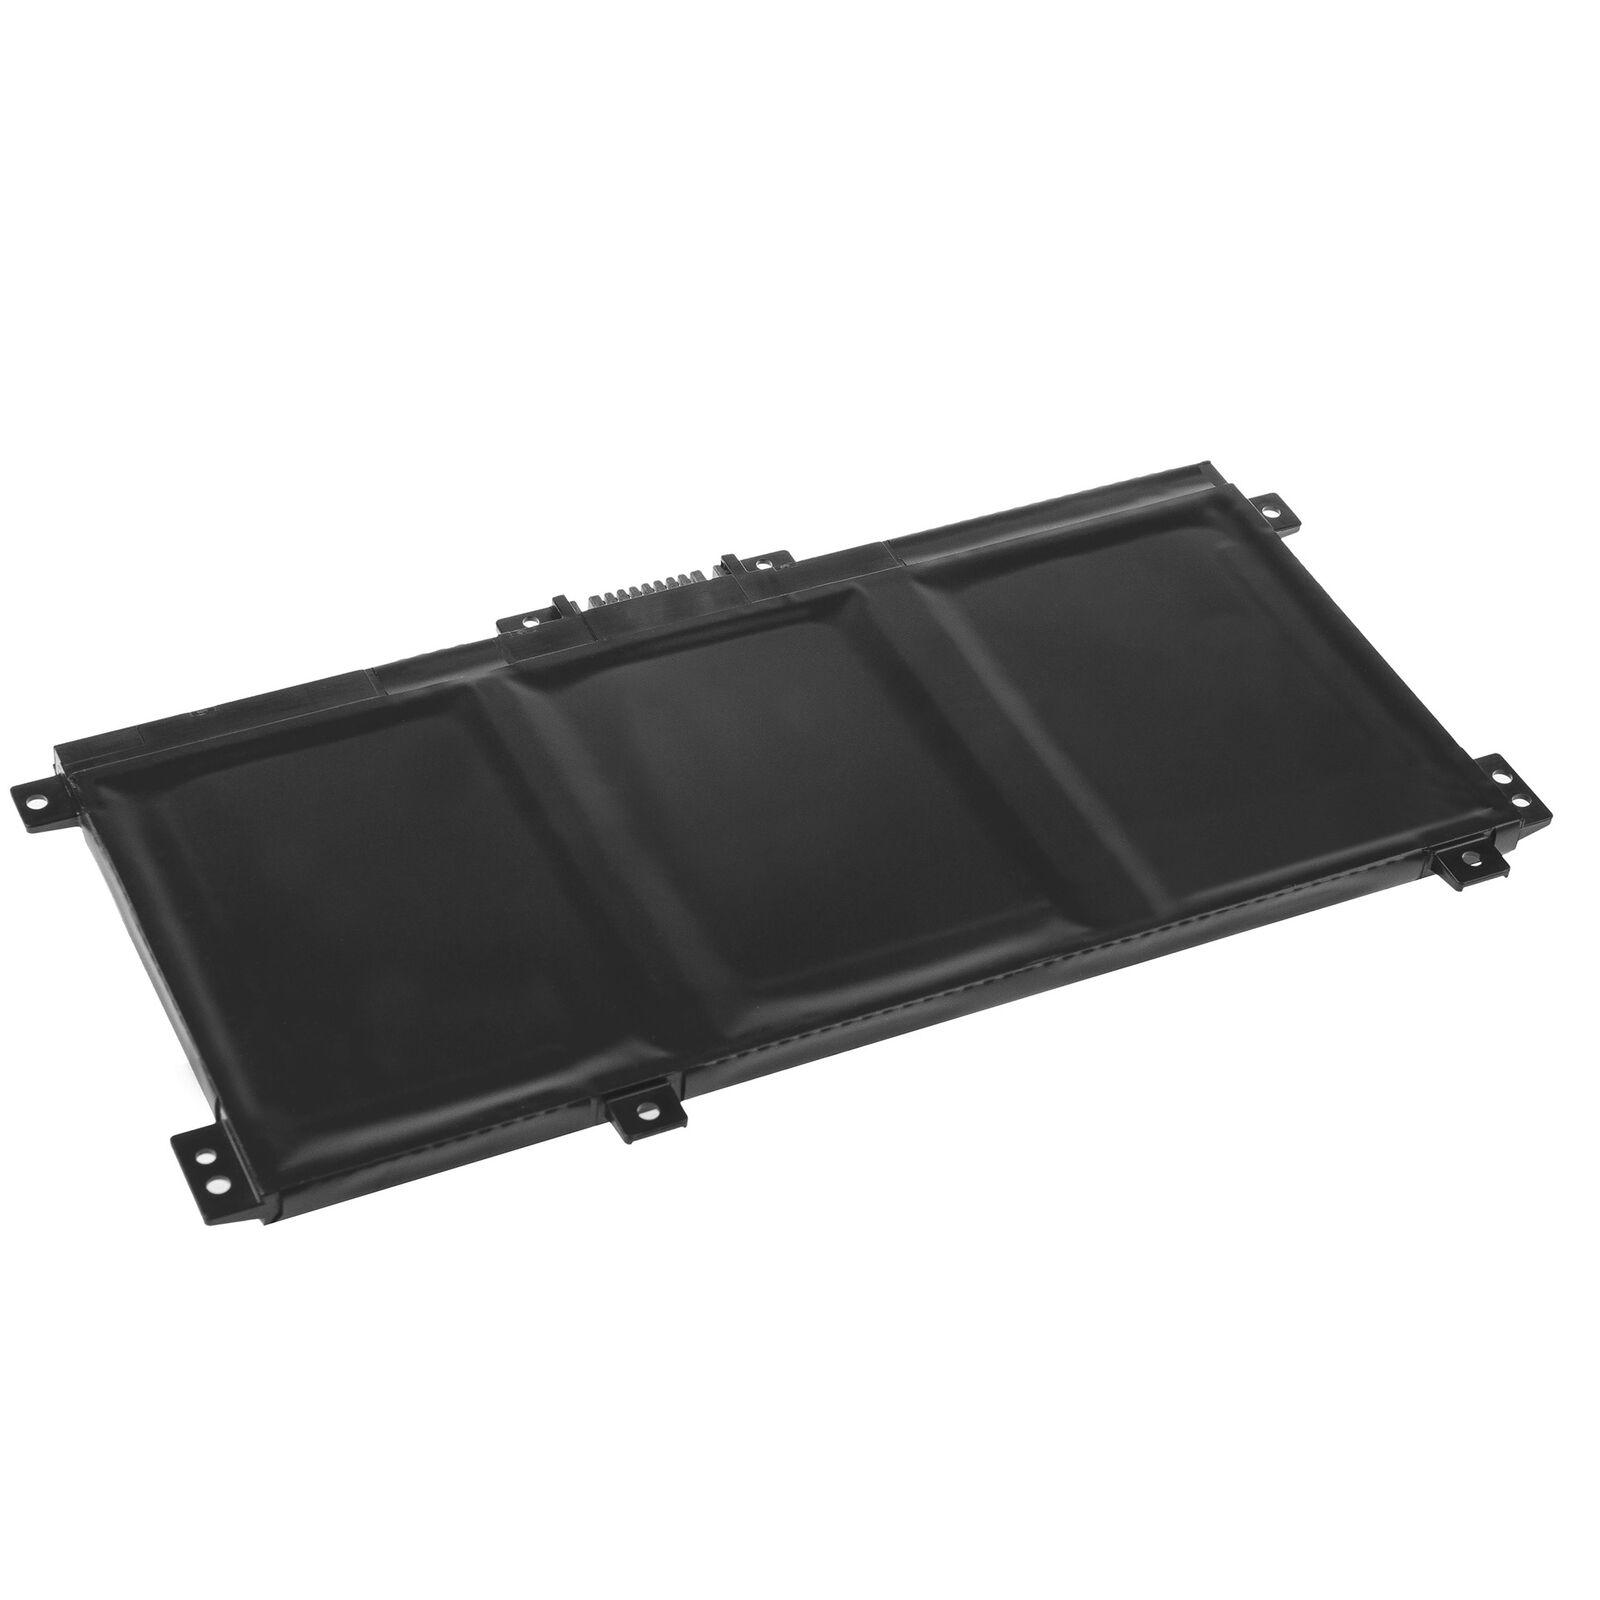 HP Envy x360 15-BP 15-CN 17-AE 17-BW LK03XL TPN-I129 HSTNN-UB7I compatible battery